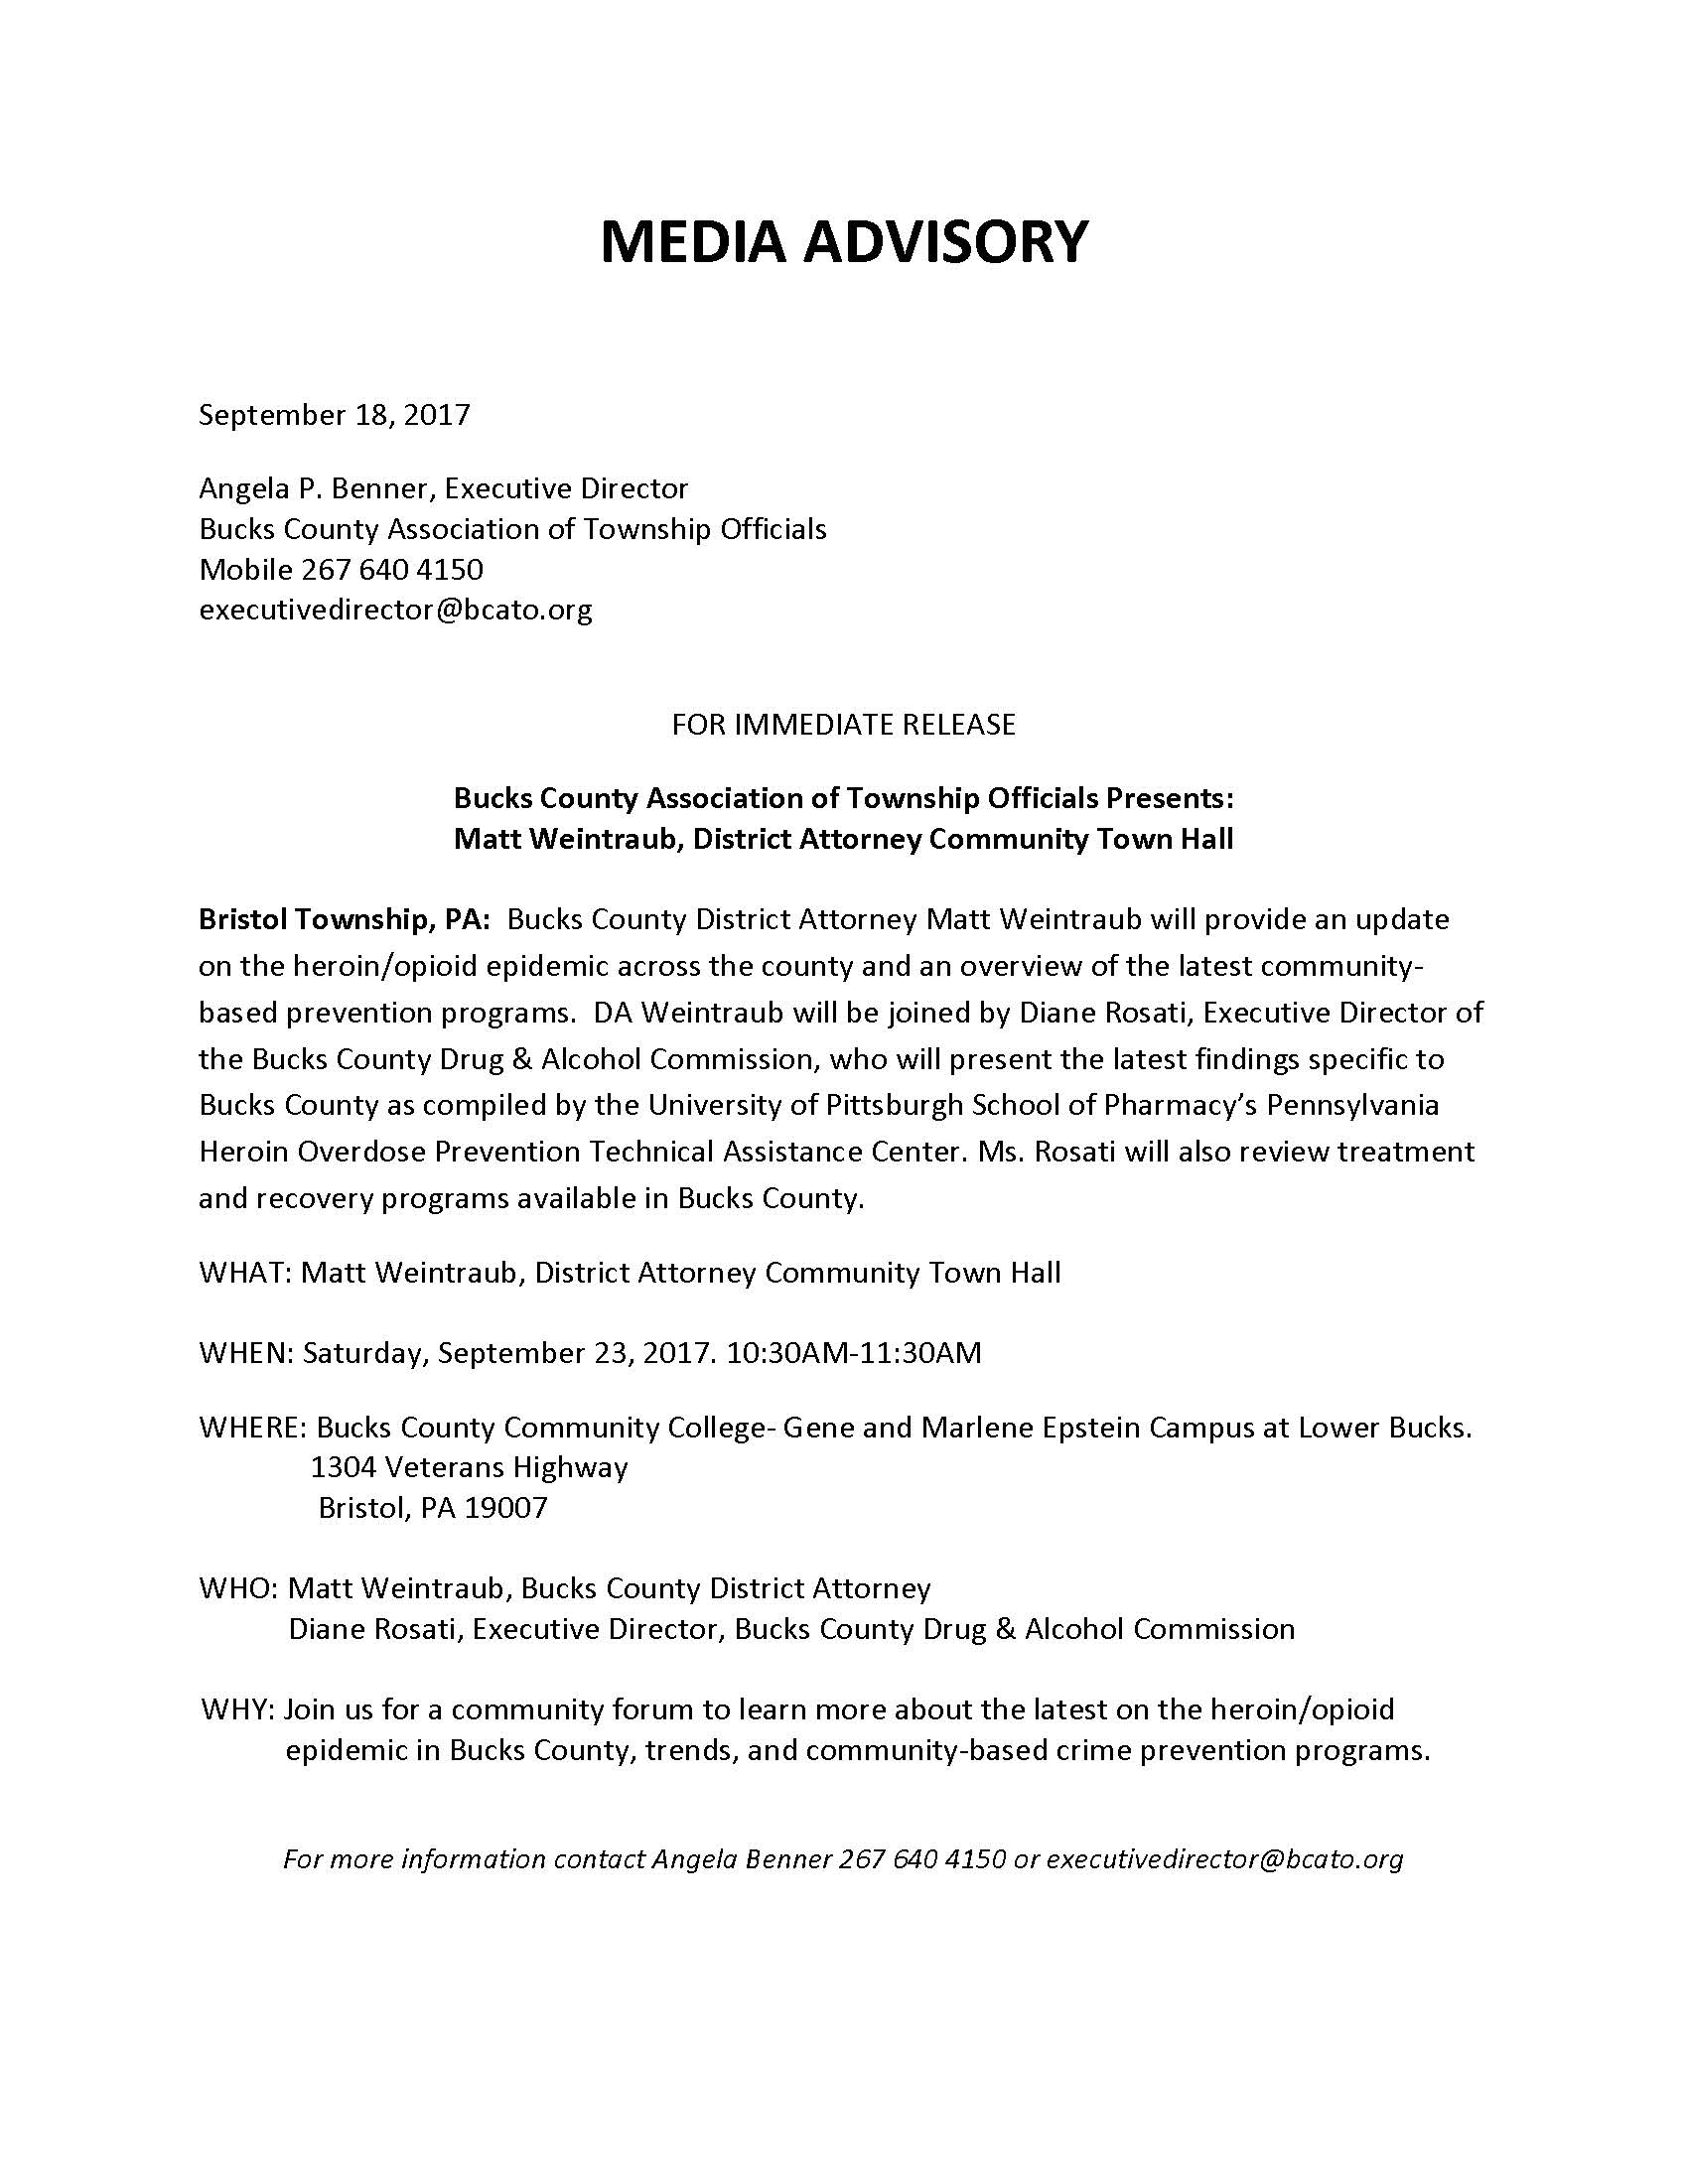 MEDIA ADVISORY District Attorney Weintraub. Town Hall 9.23